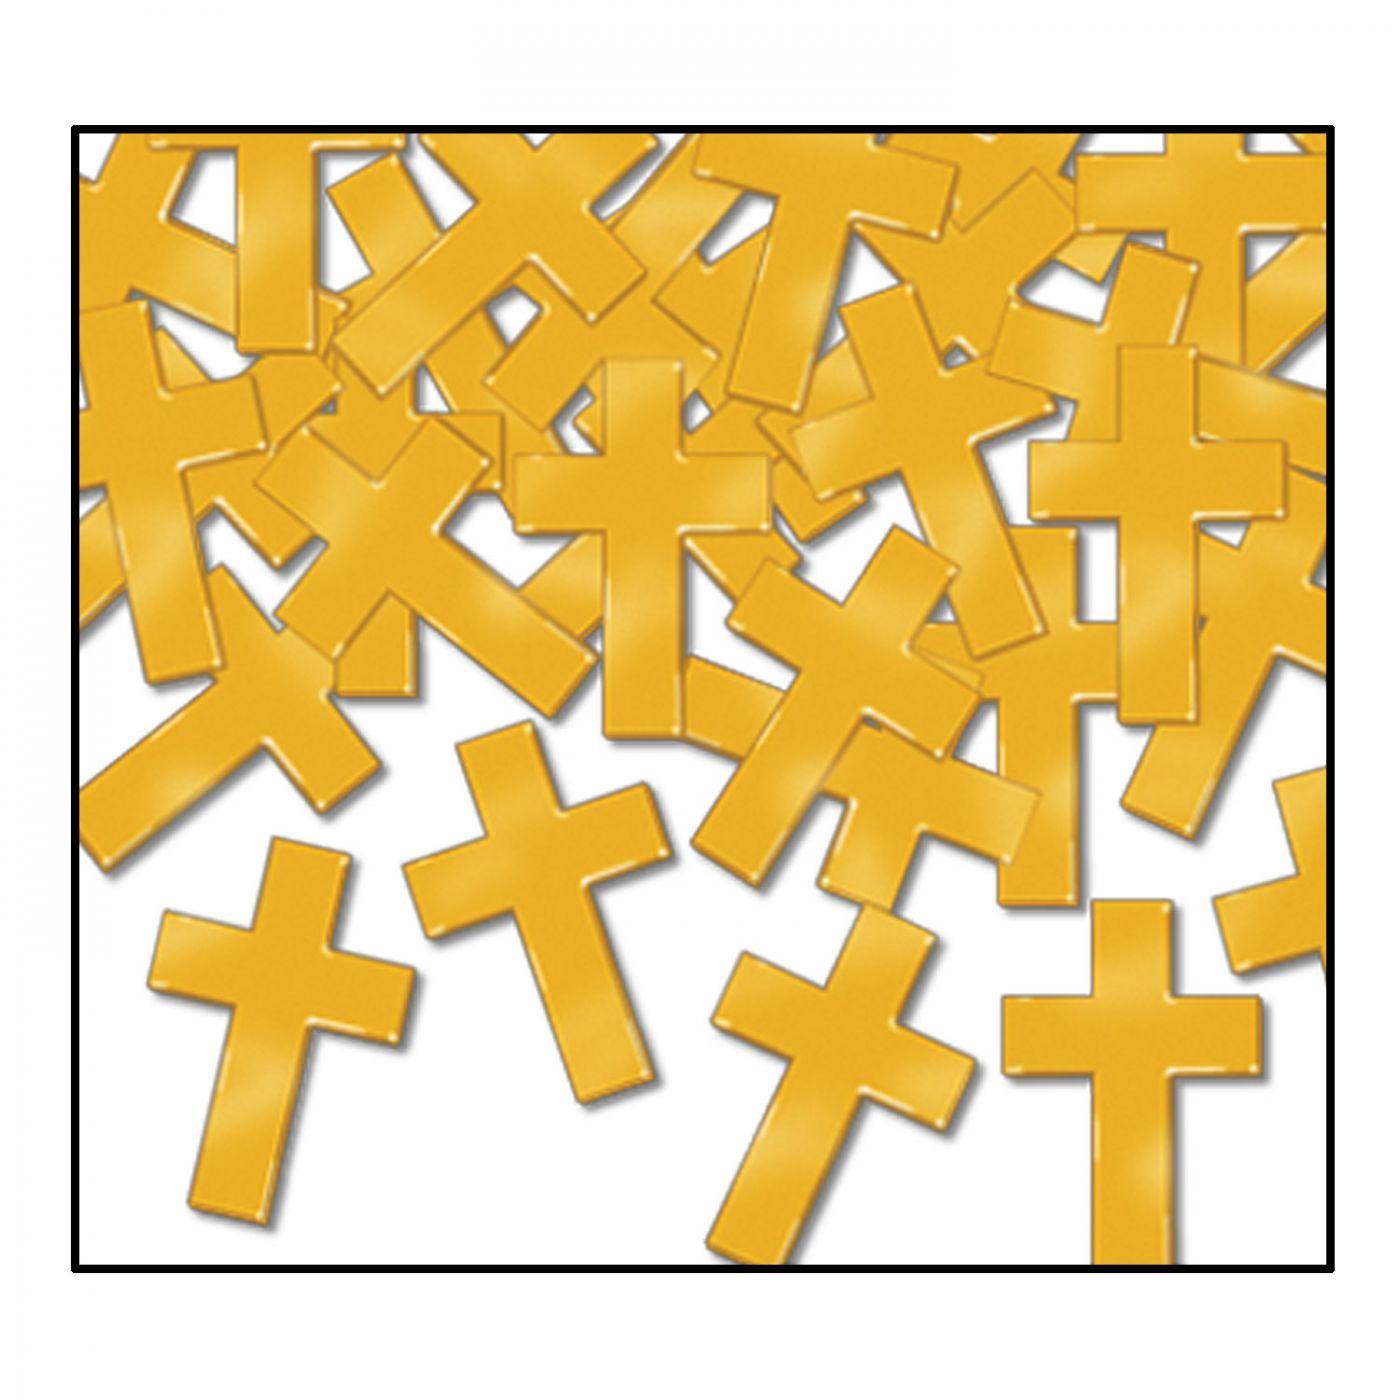 Fanci-Fetti Crosses image